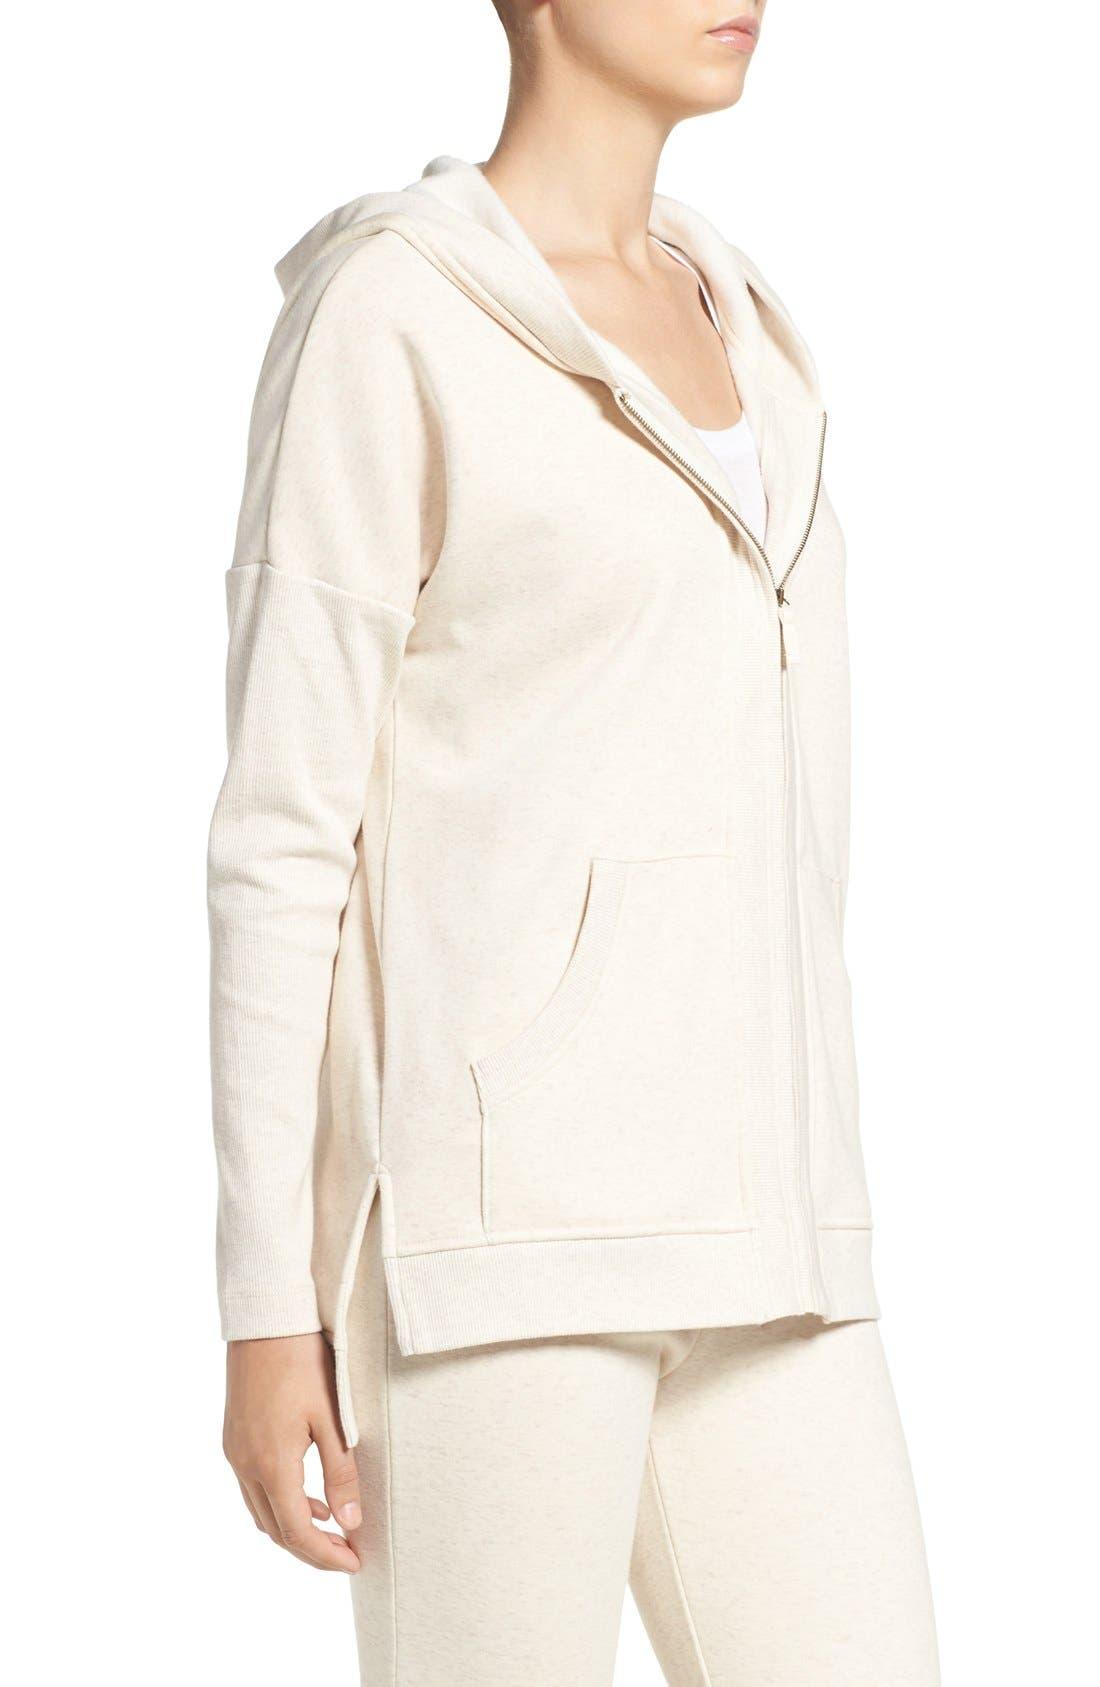 Alternate Image 3  - UGG® 'Mavis' Stretch Cotton Zip-Up Hoodie